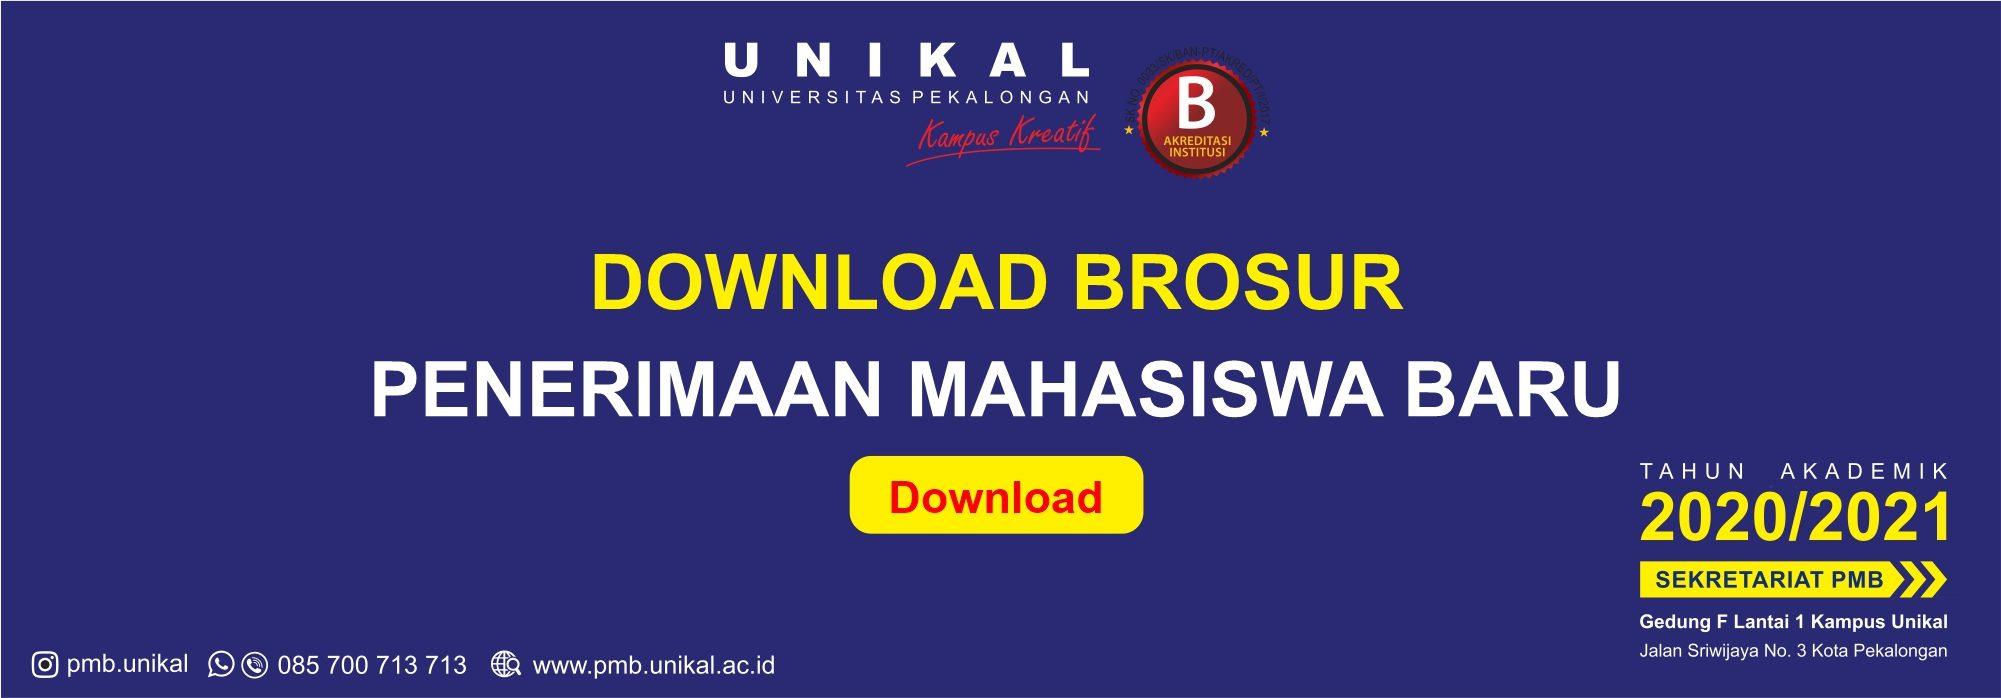 Download Brosur PMB Unikal 2020